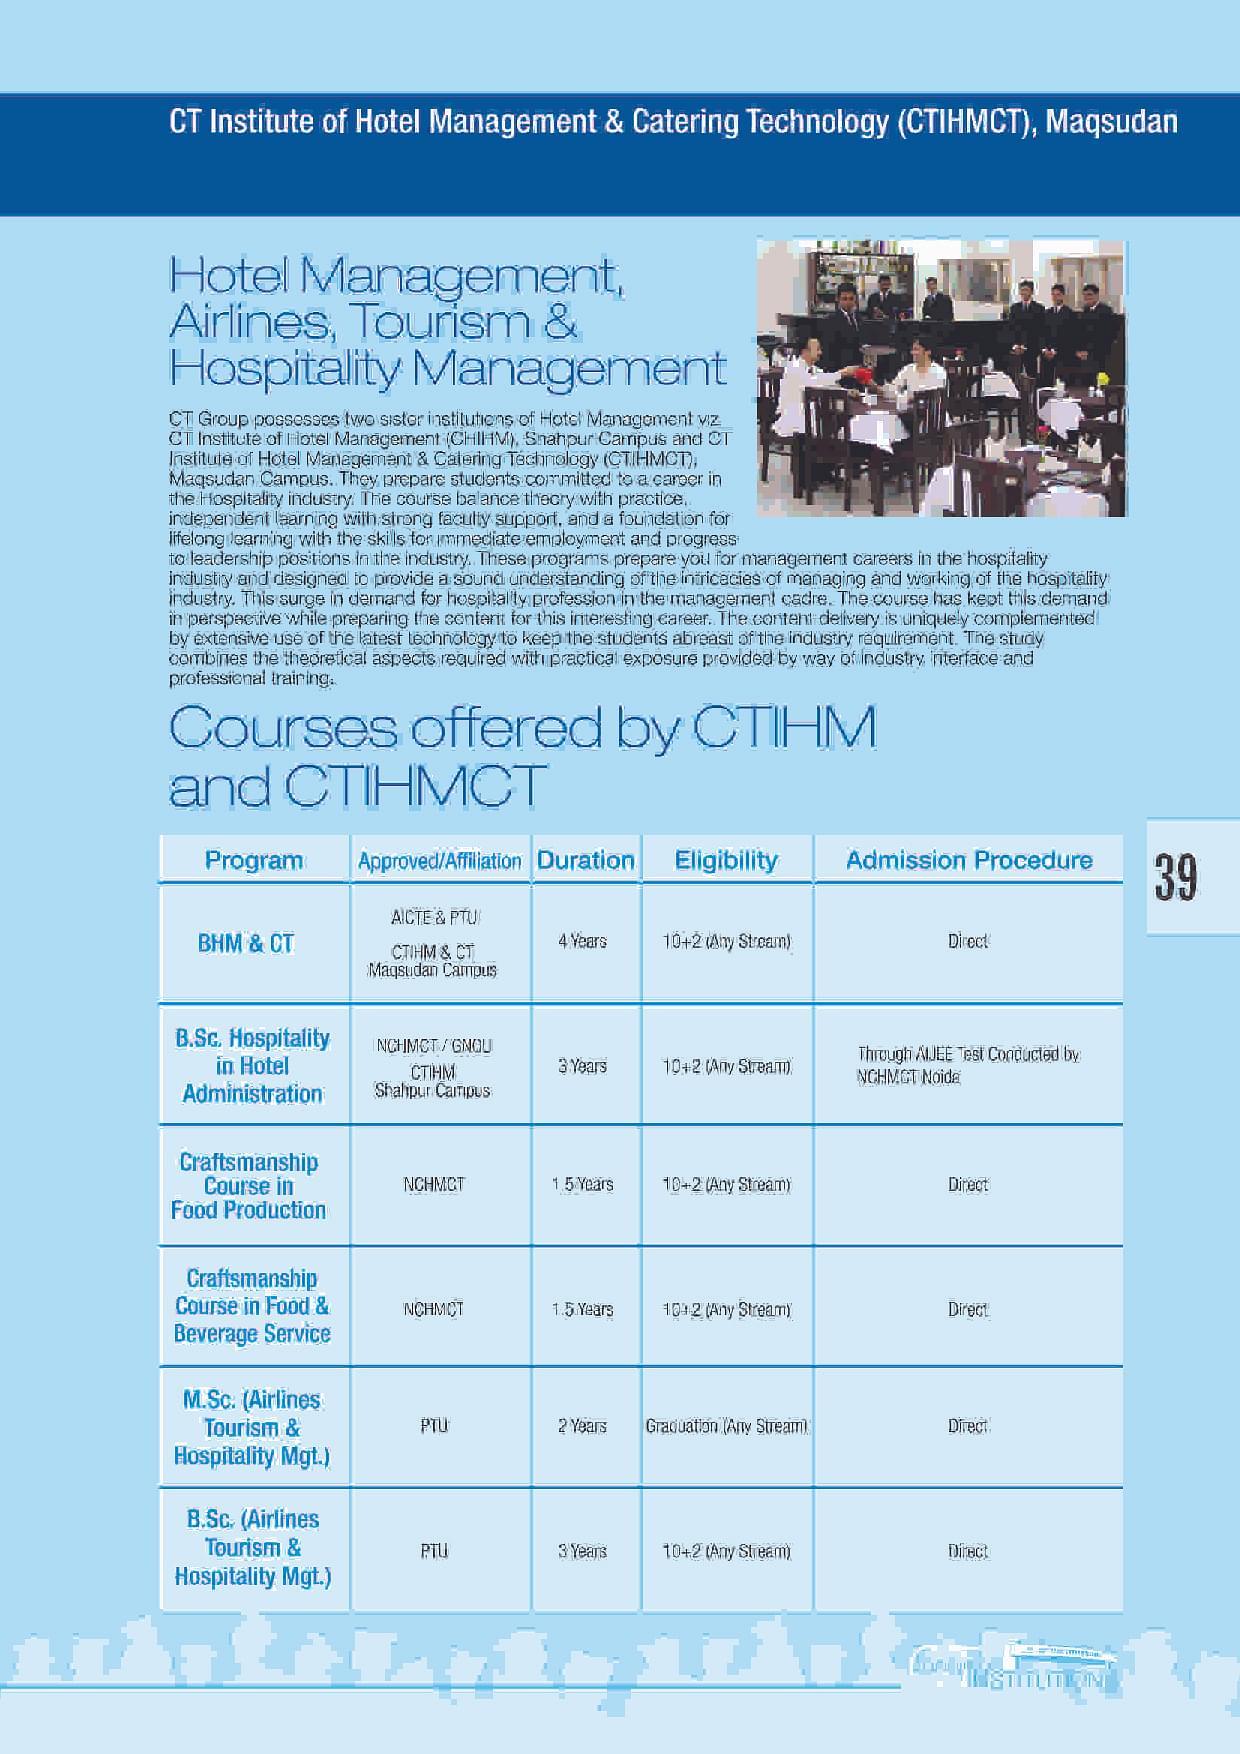 CT Institute of Hotel Management & Catering Technology, Jalandhar